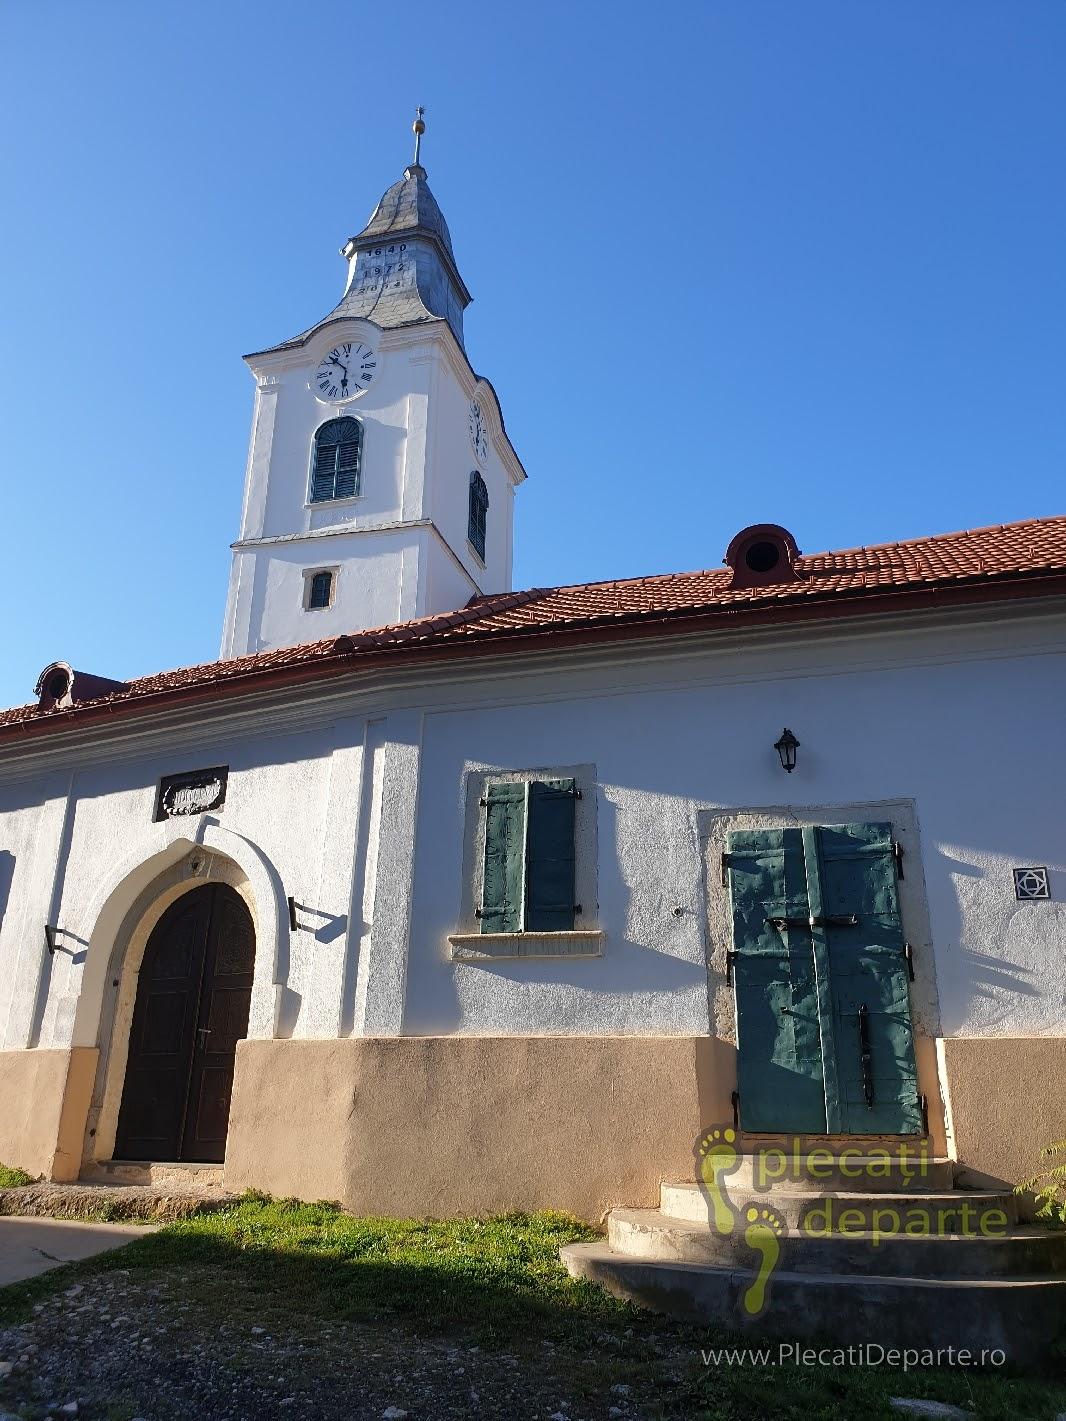 Arhitectura secuiasca in satul Rimetea, Alba